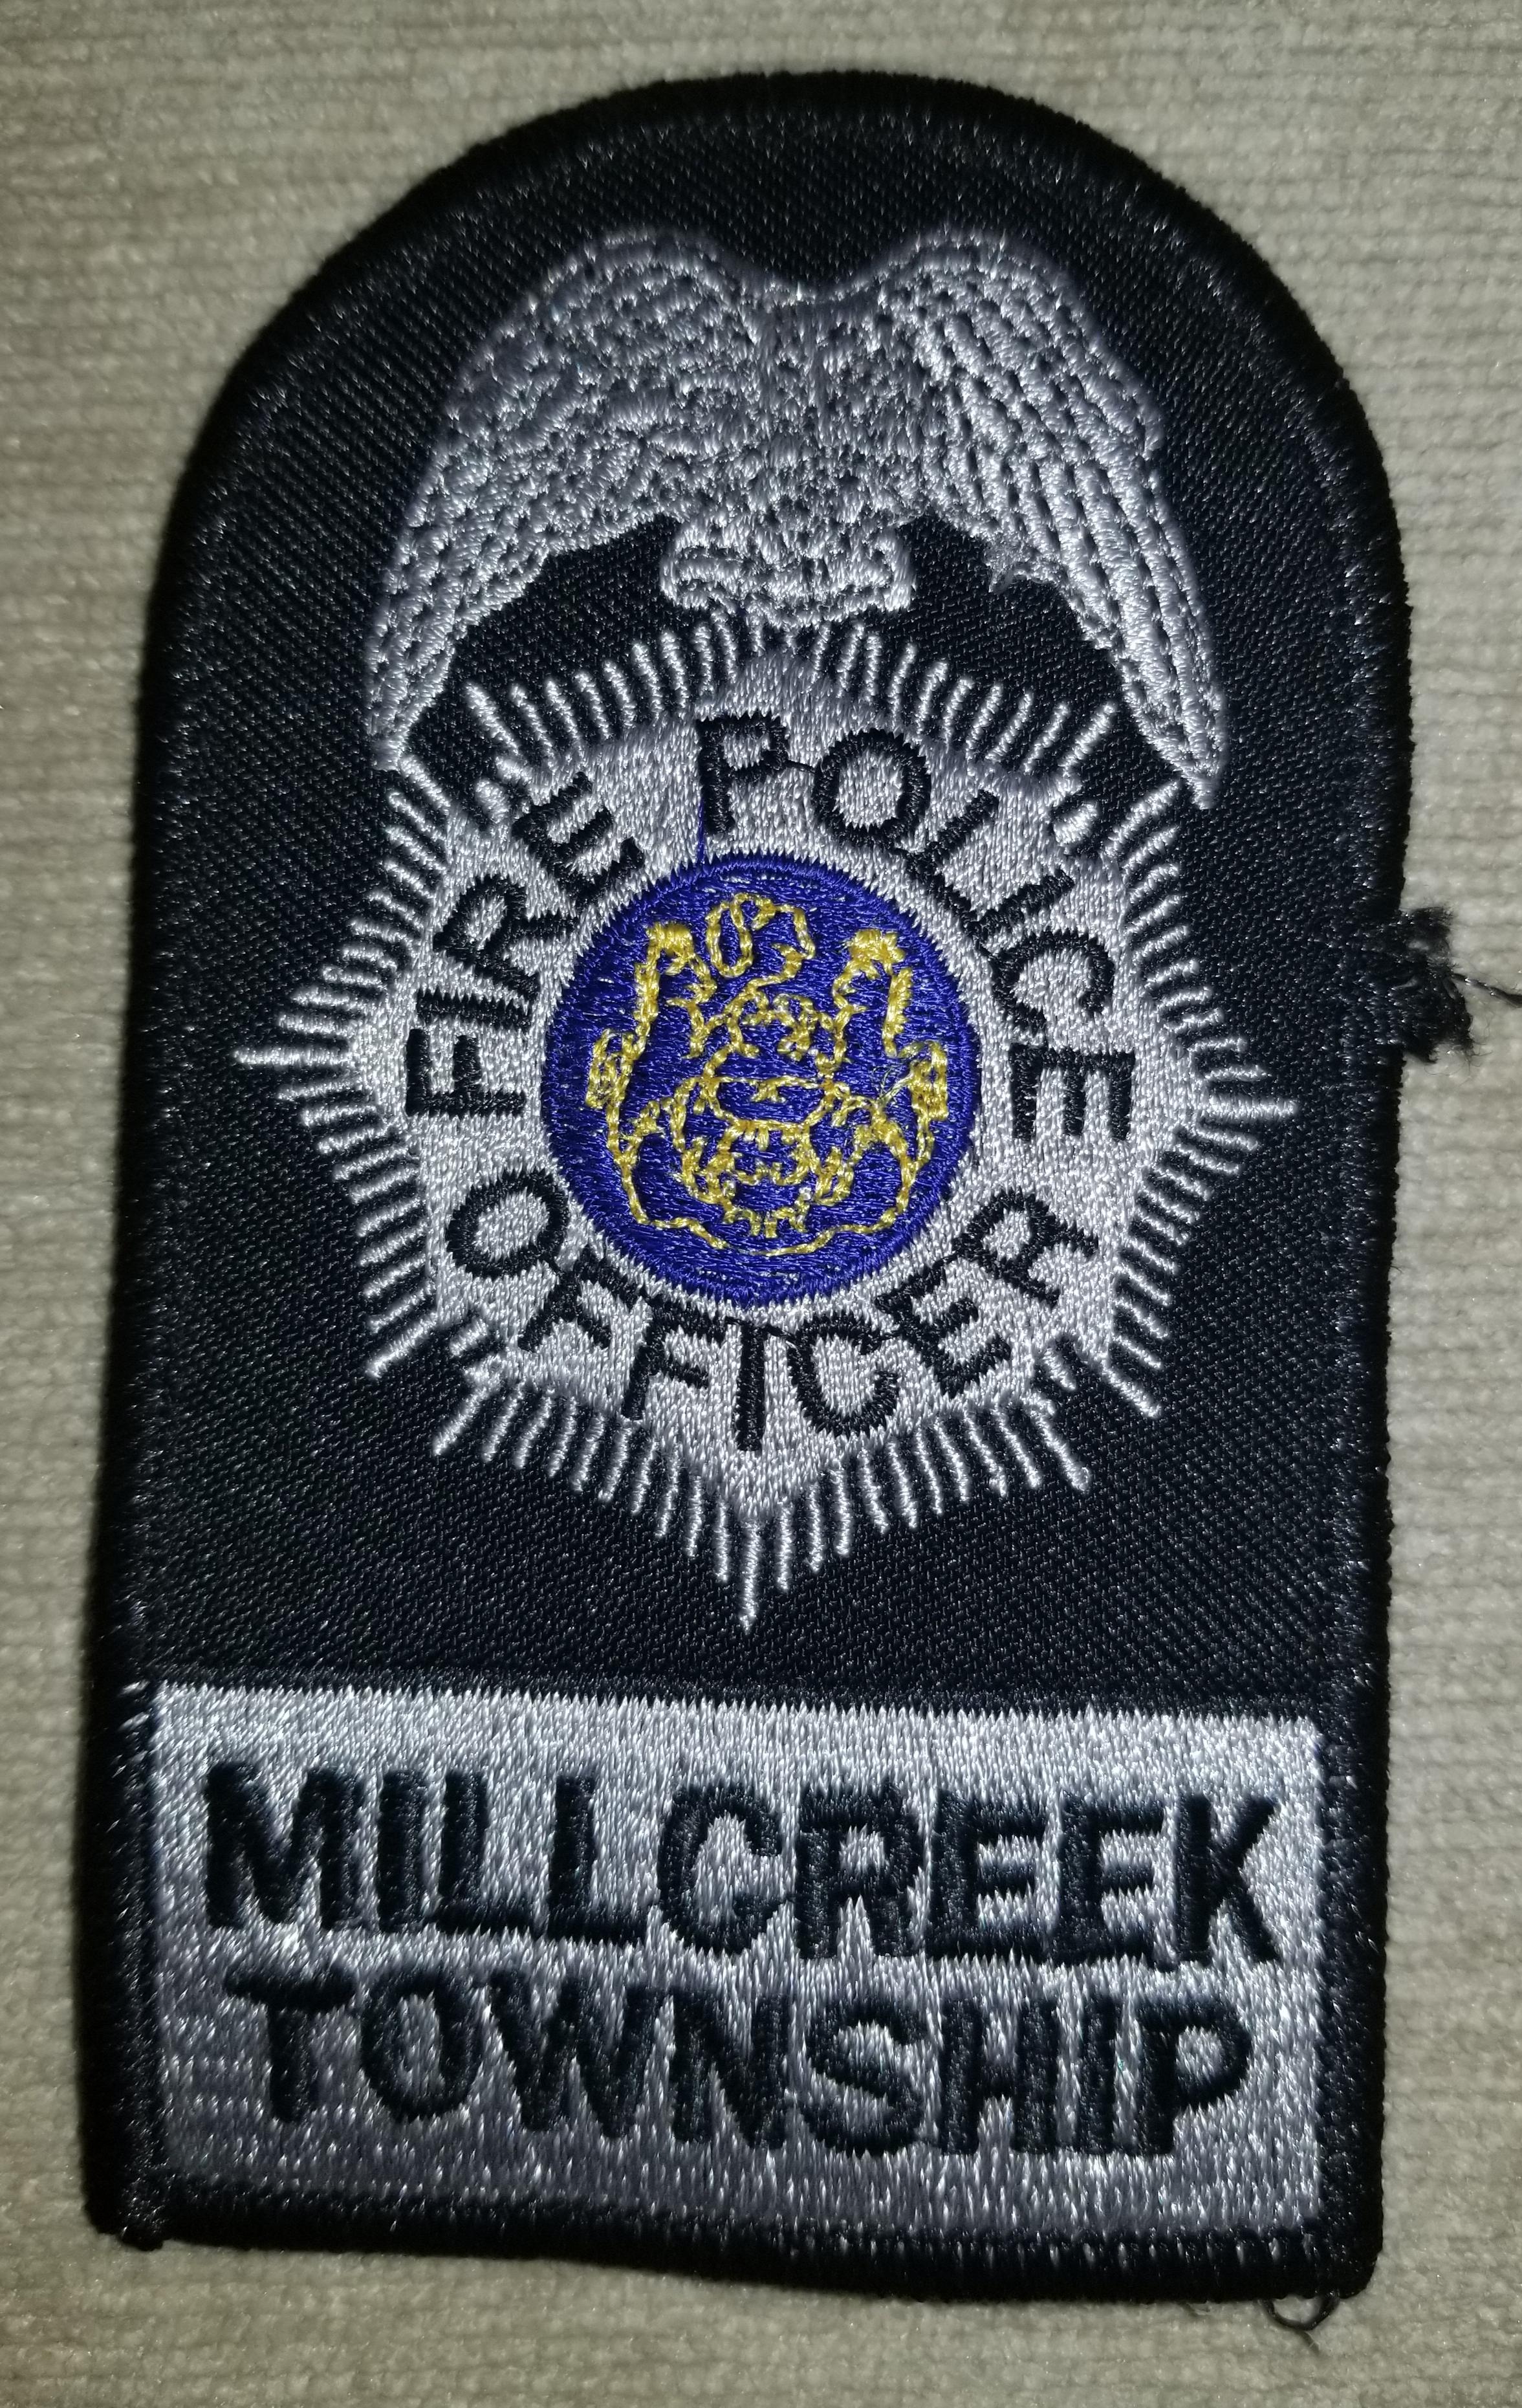 Millcreek Township Fire Police PA